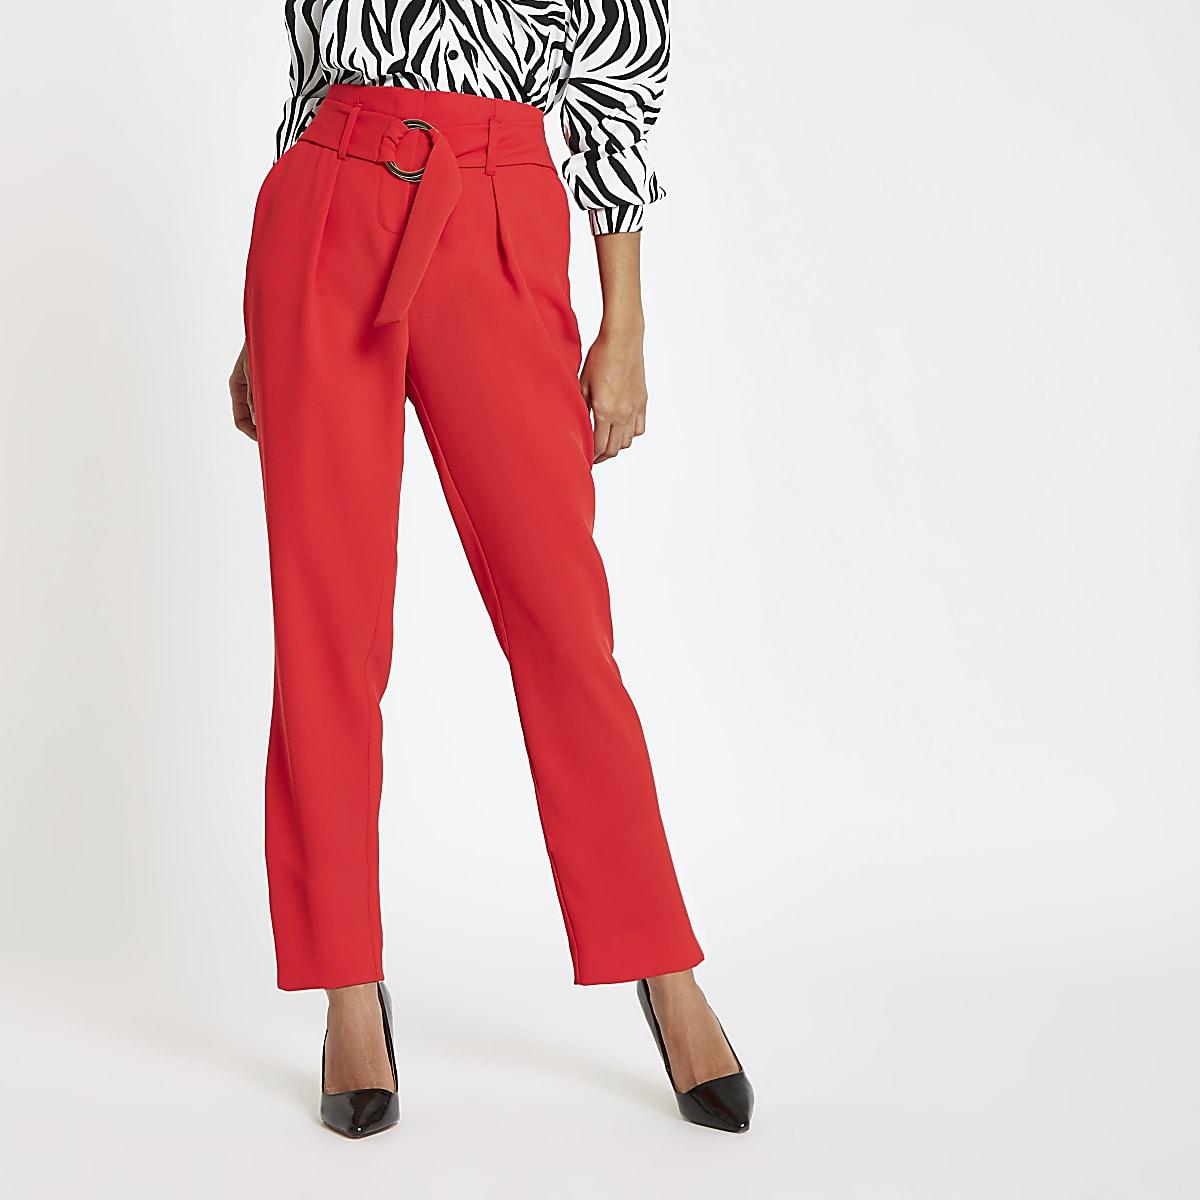 Petite red tie waist peg pants